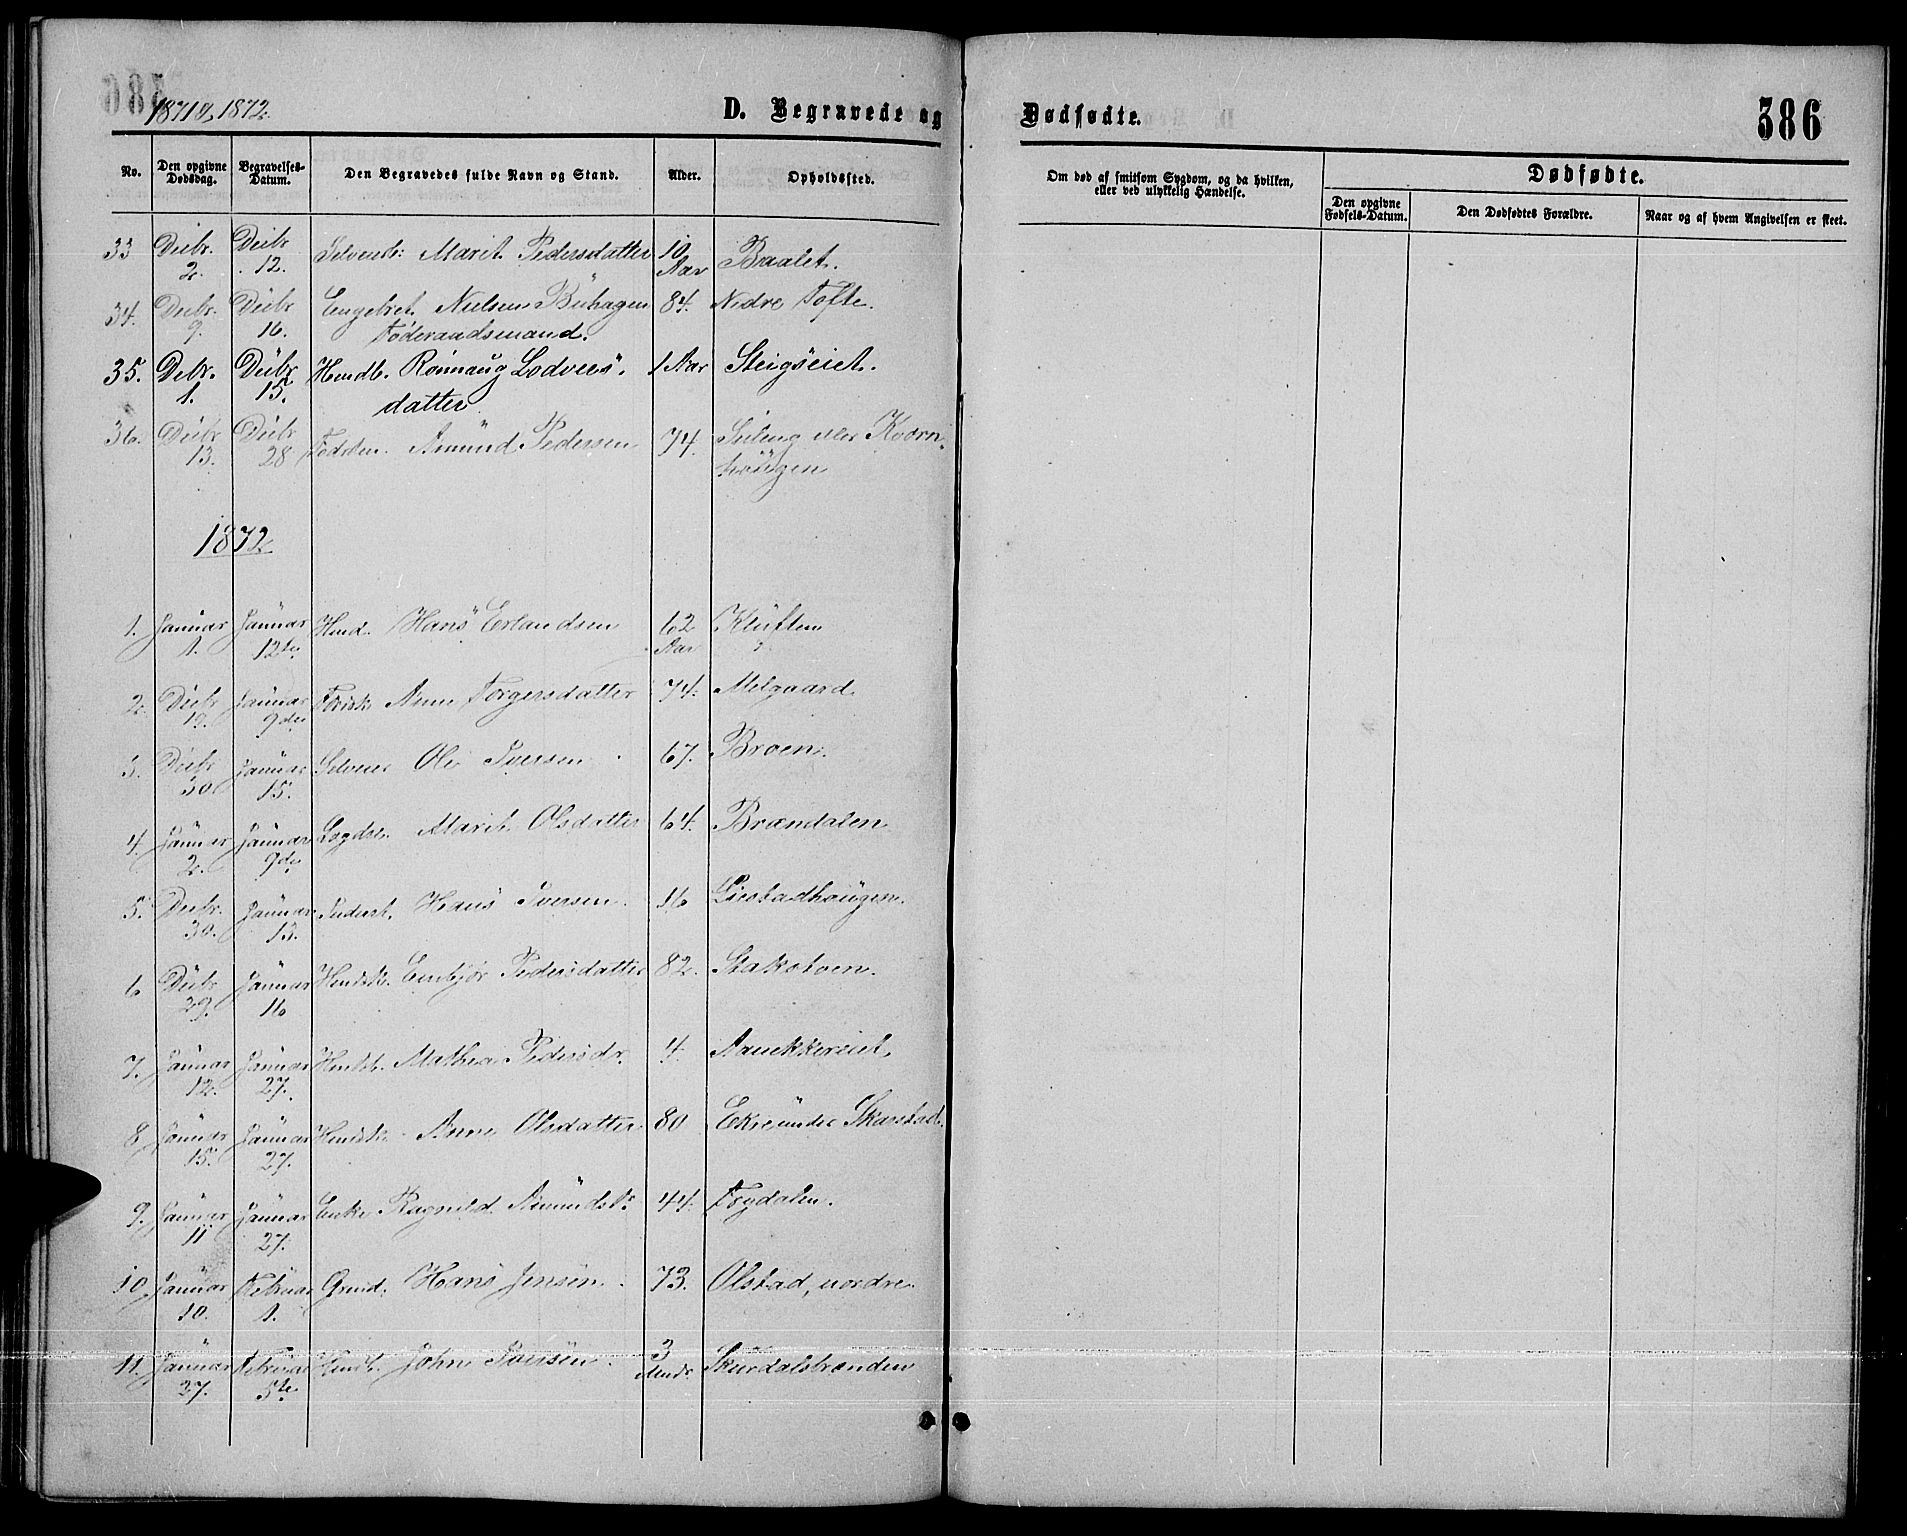 SAH, Sør-Fron prestekontor, H/Ha/Hab/L0002: Klokkerbok nr. 2, 1864-1883, s. 386